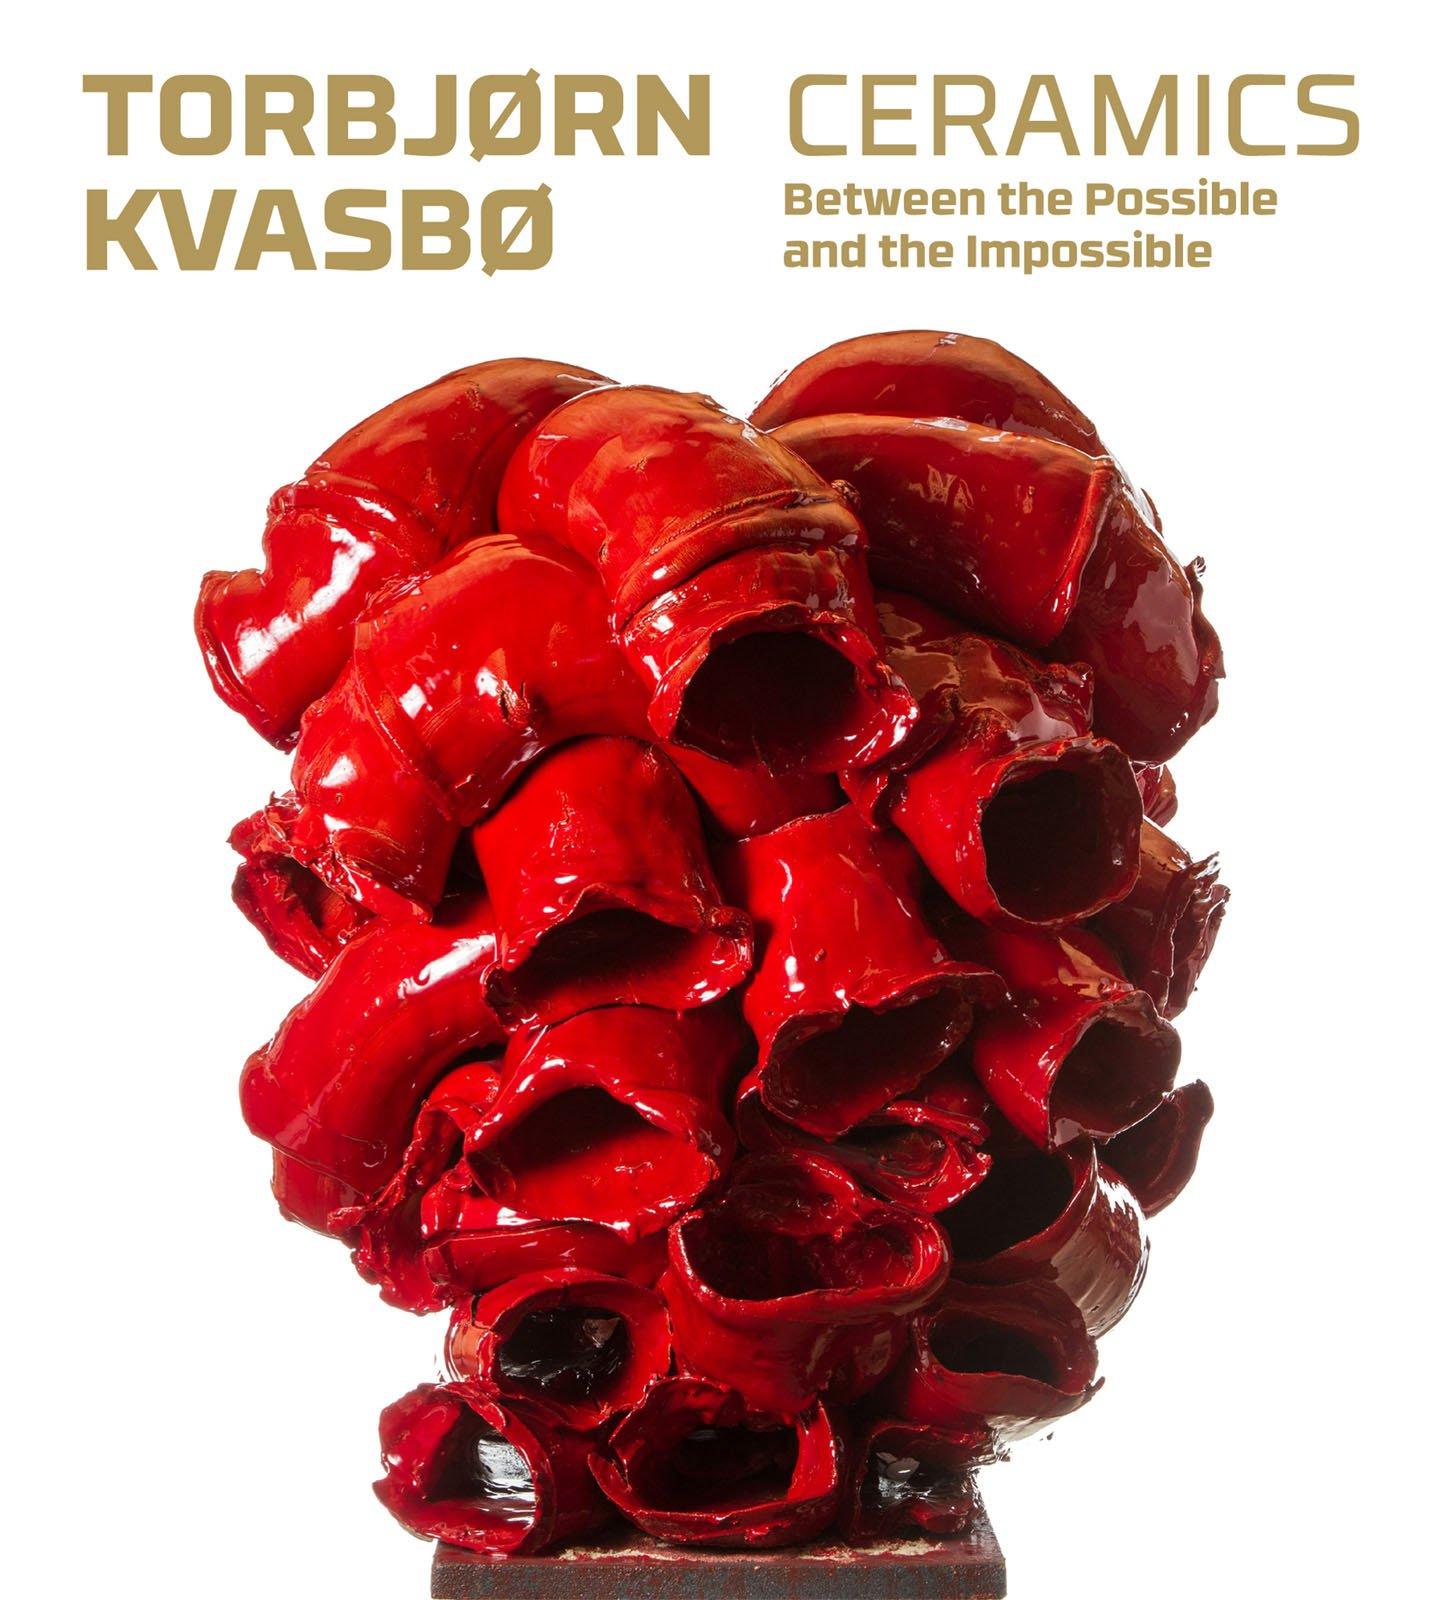 Torbjørn Kvasbø – Ceramics: Between the Possible and the Impossible